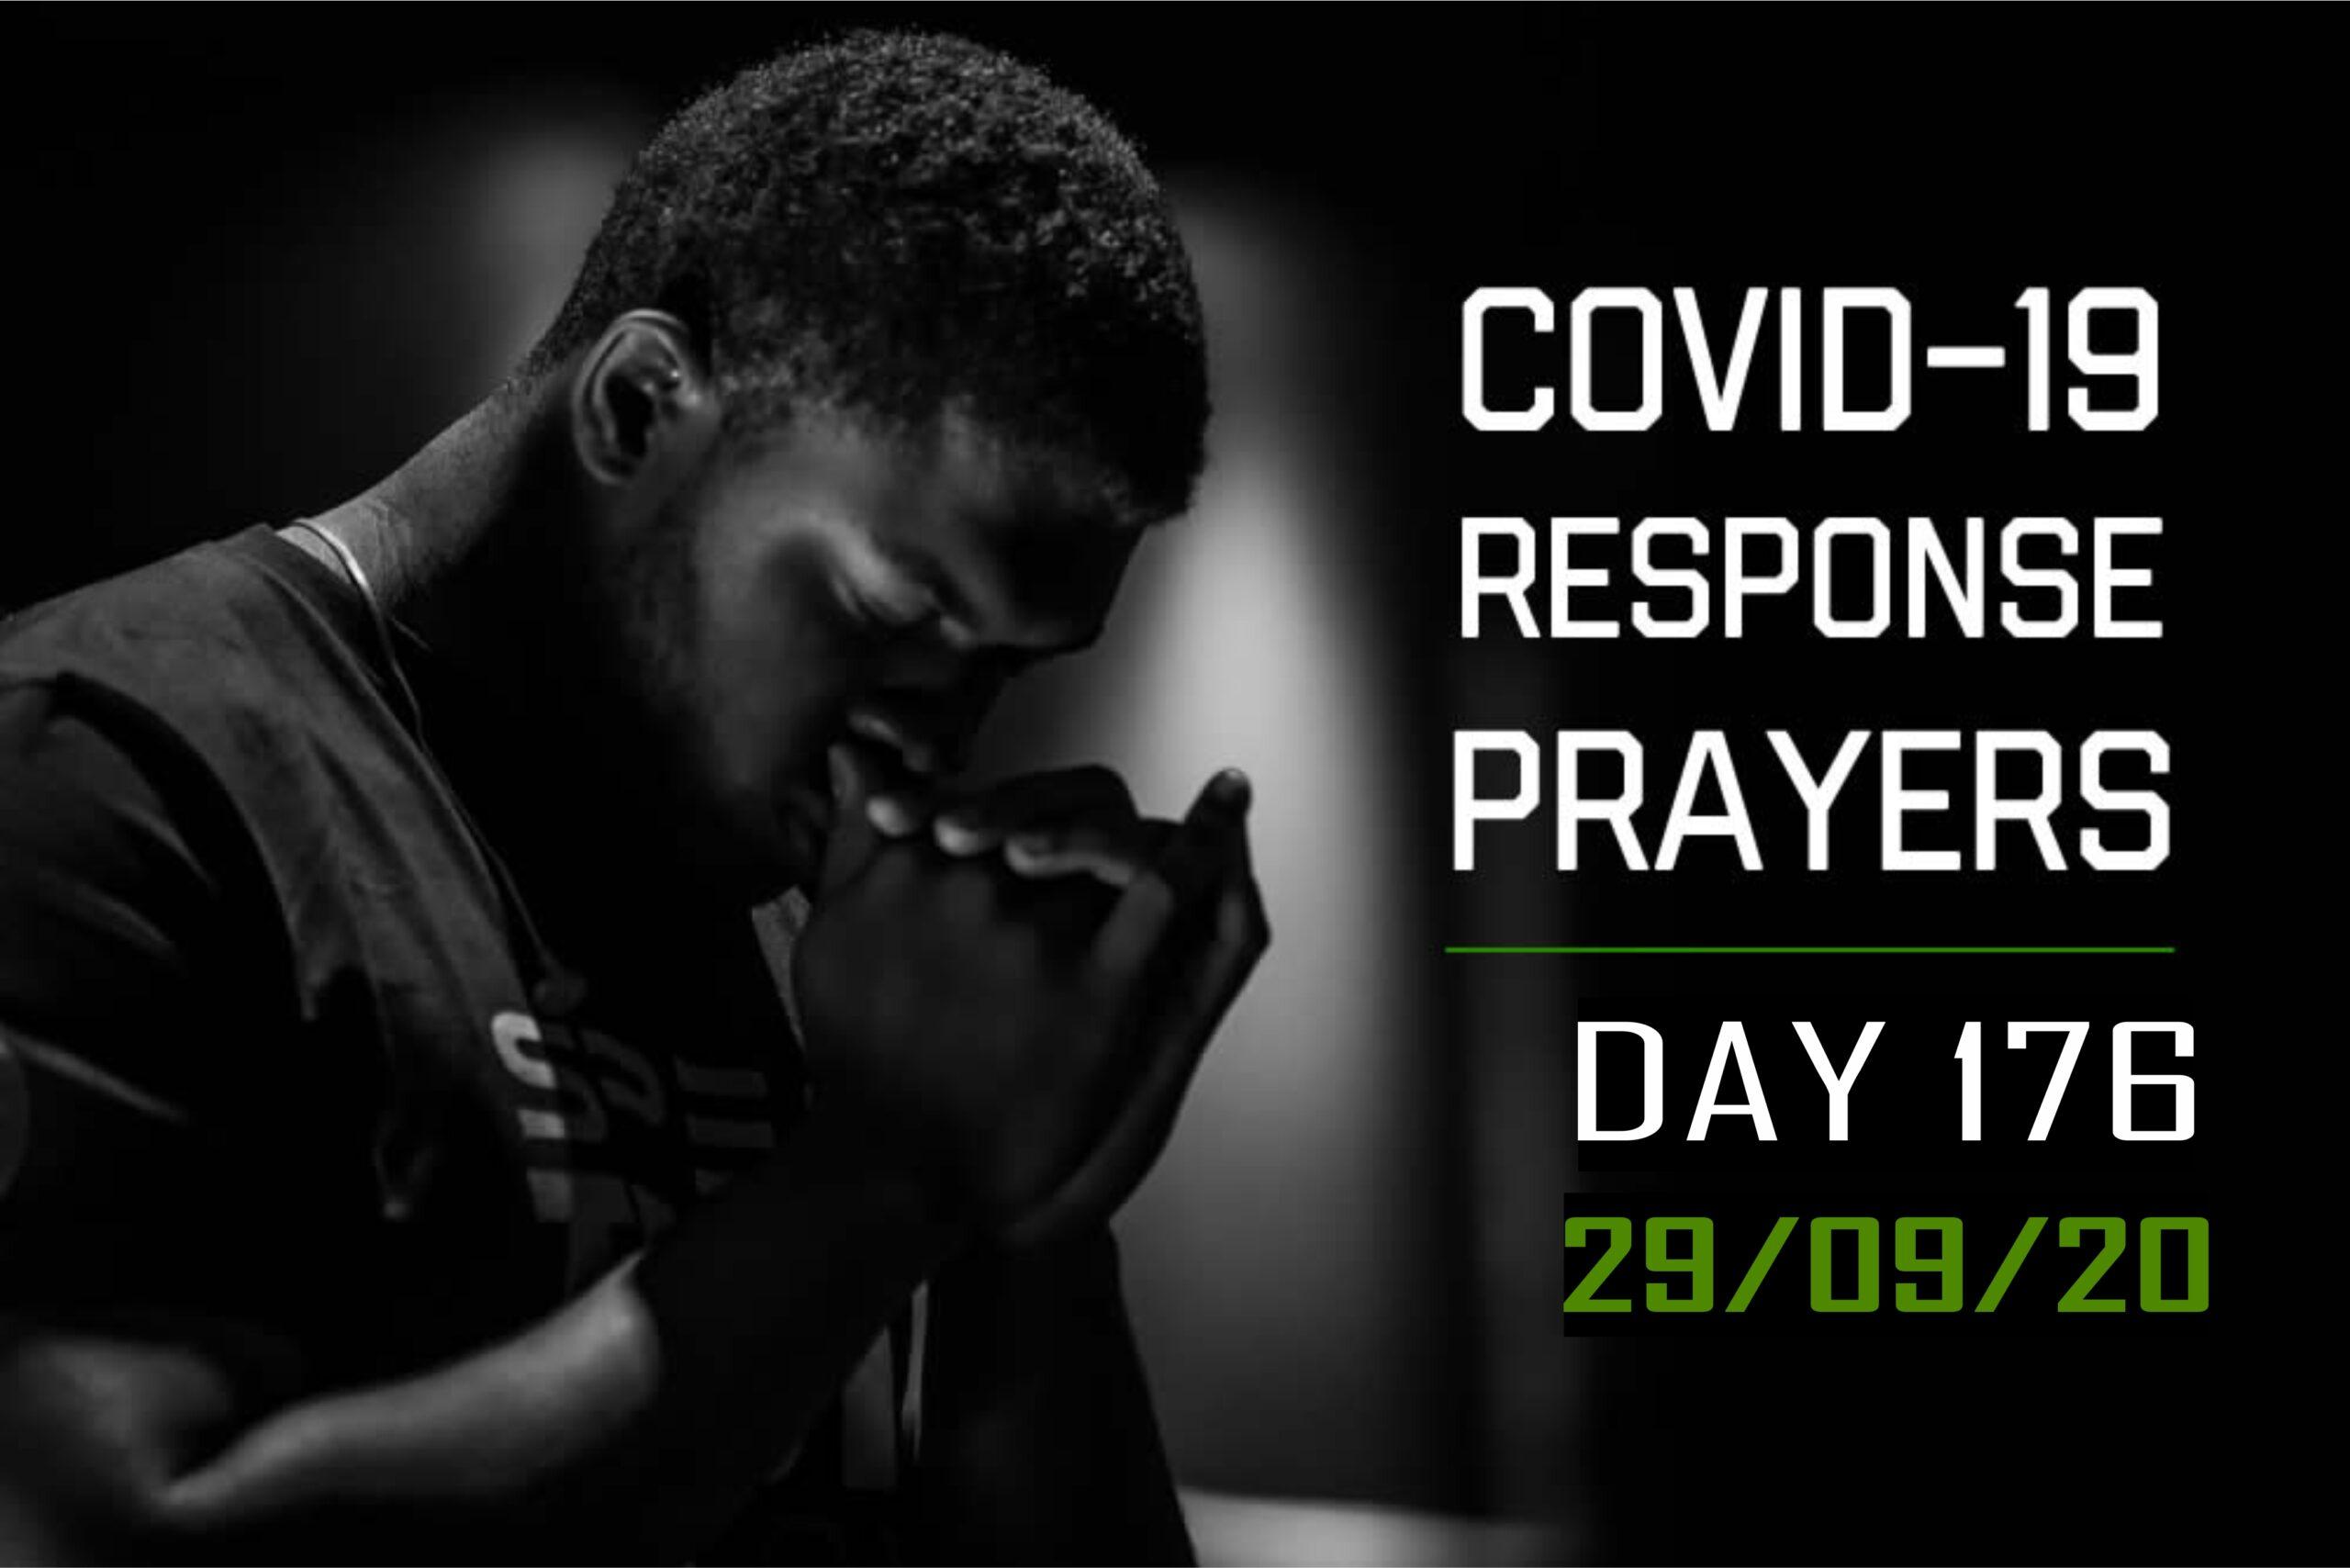 COVID-19 Response Prayers Day – 176